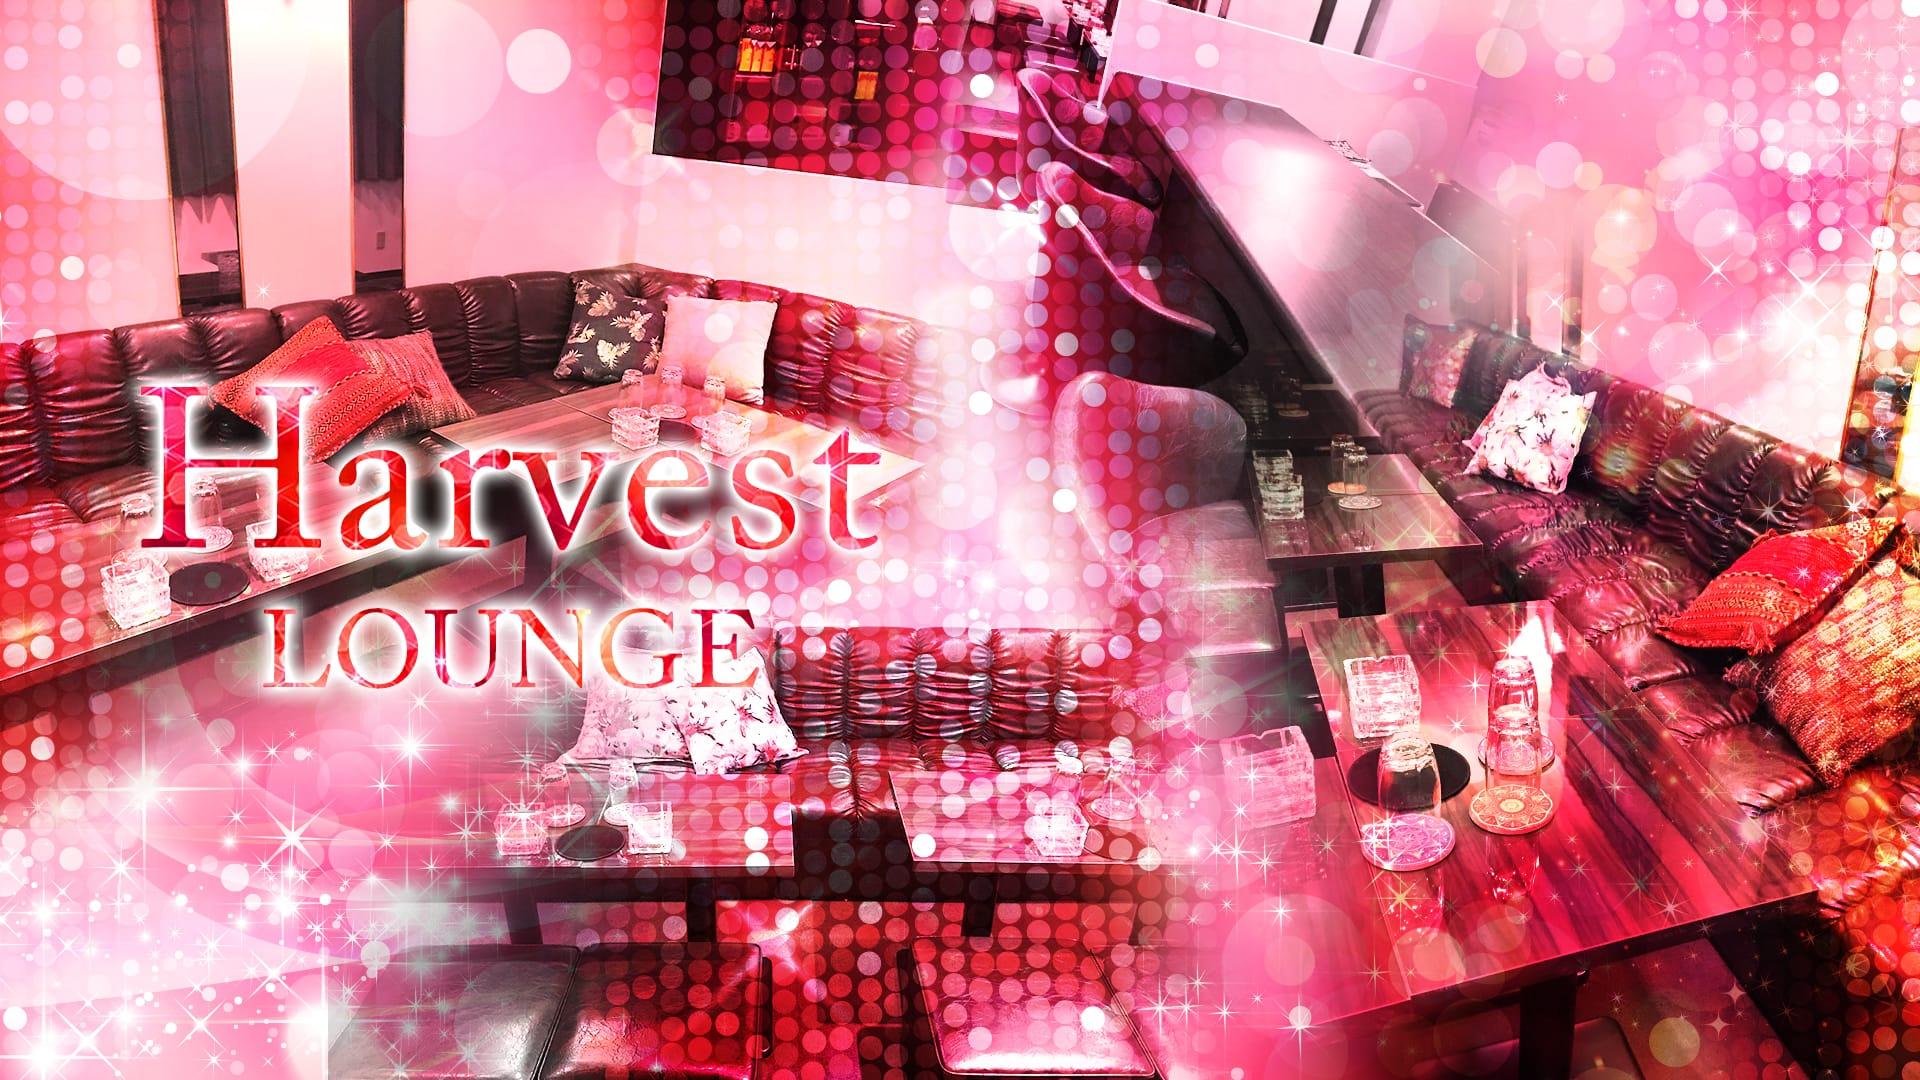 Lounge  Harvest [ラウンジ ハーヴェスト] 川越 キャバクラ TOP画像